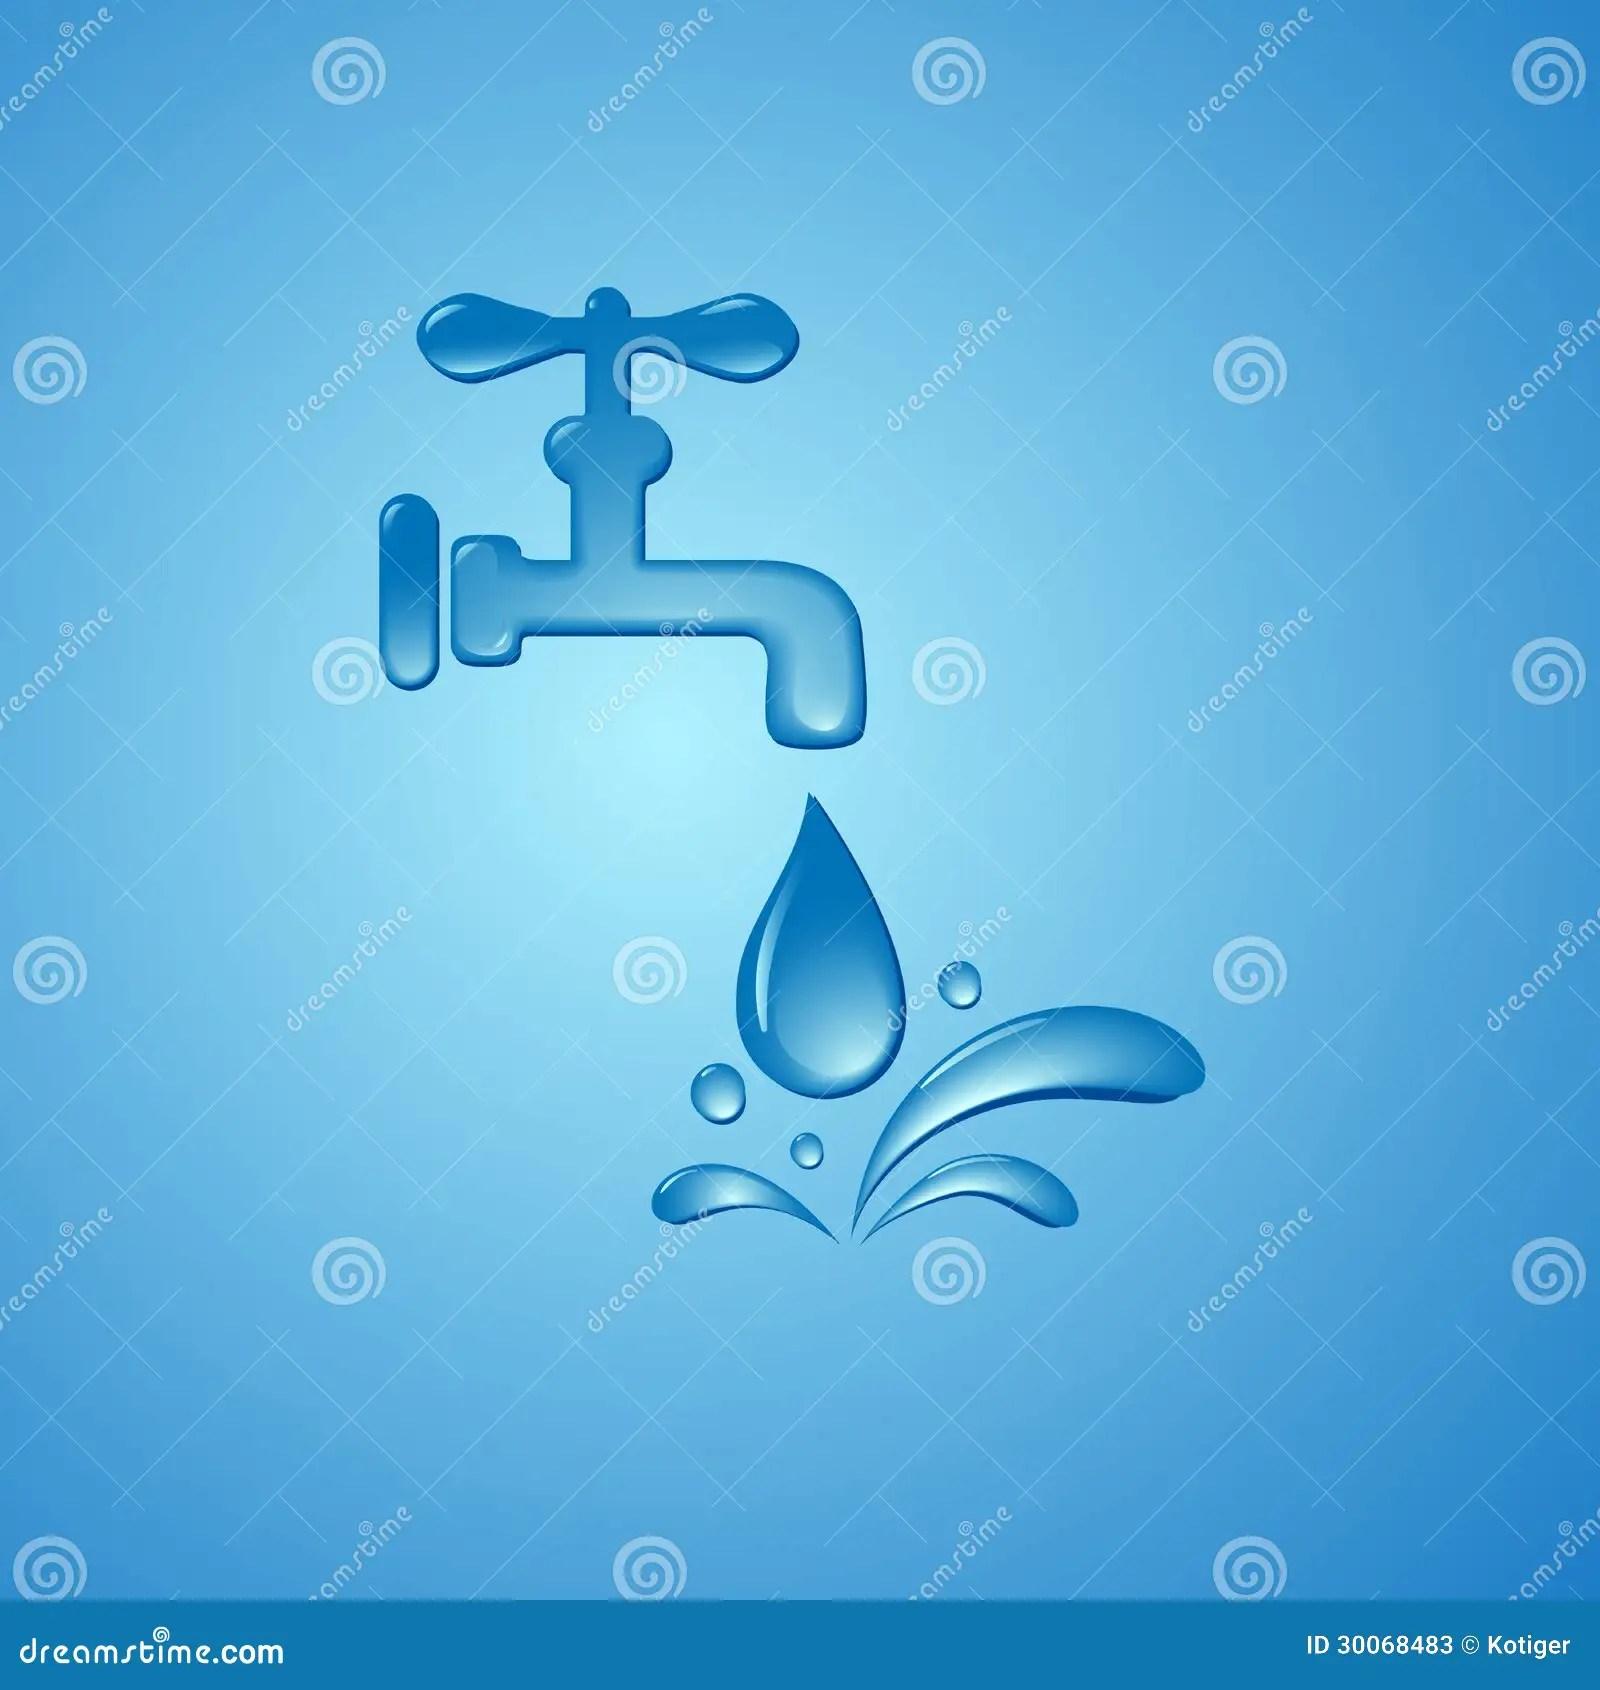 Images Drop Droplet